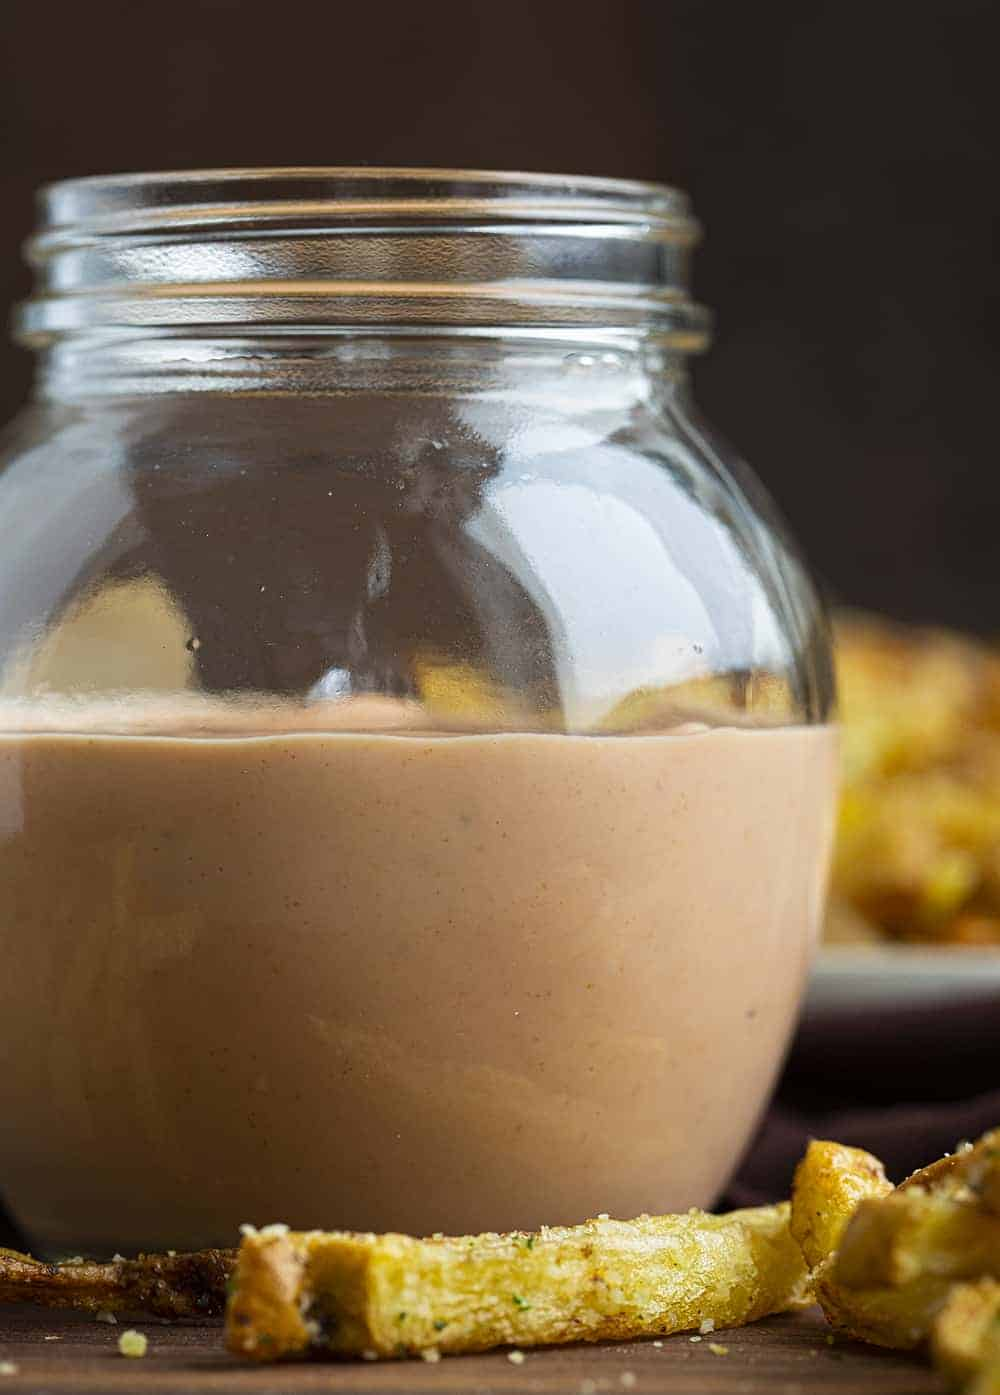 Jar of Homemade Fry Sauce